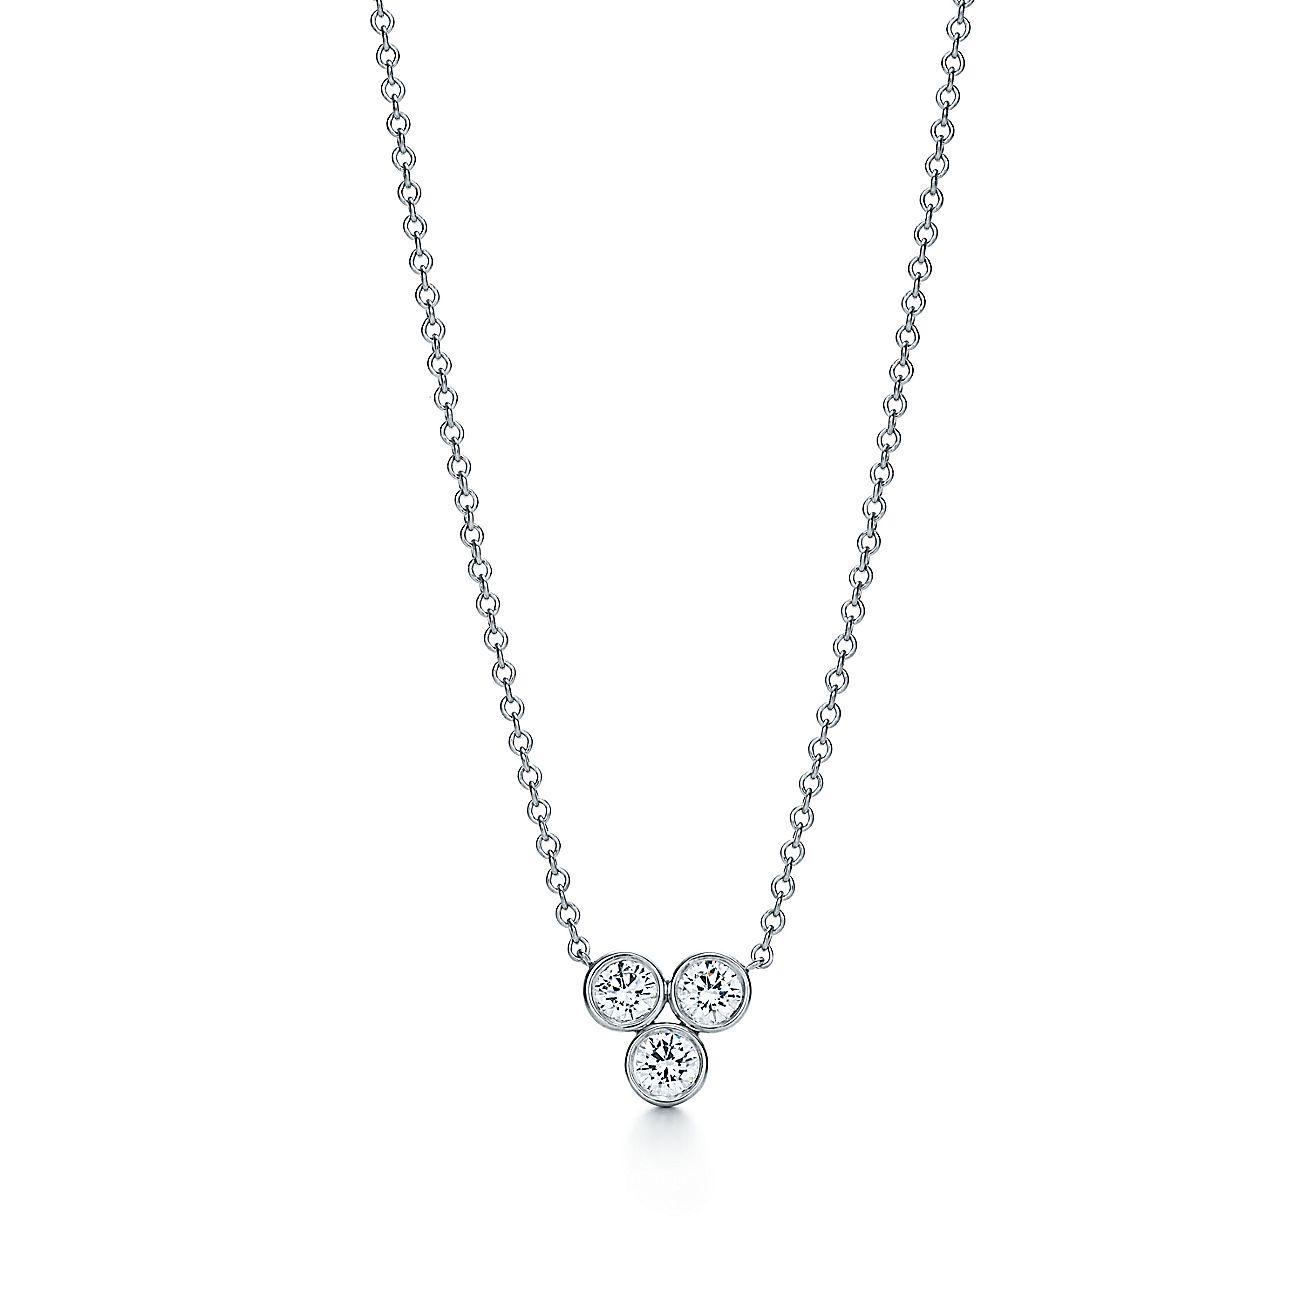 Tiffany Jazz™ pendant